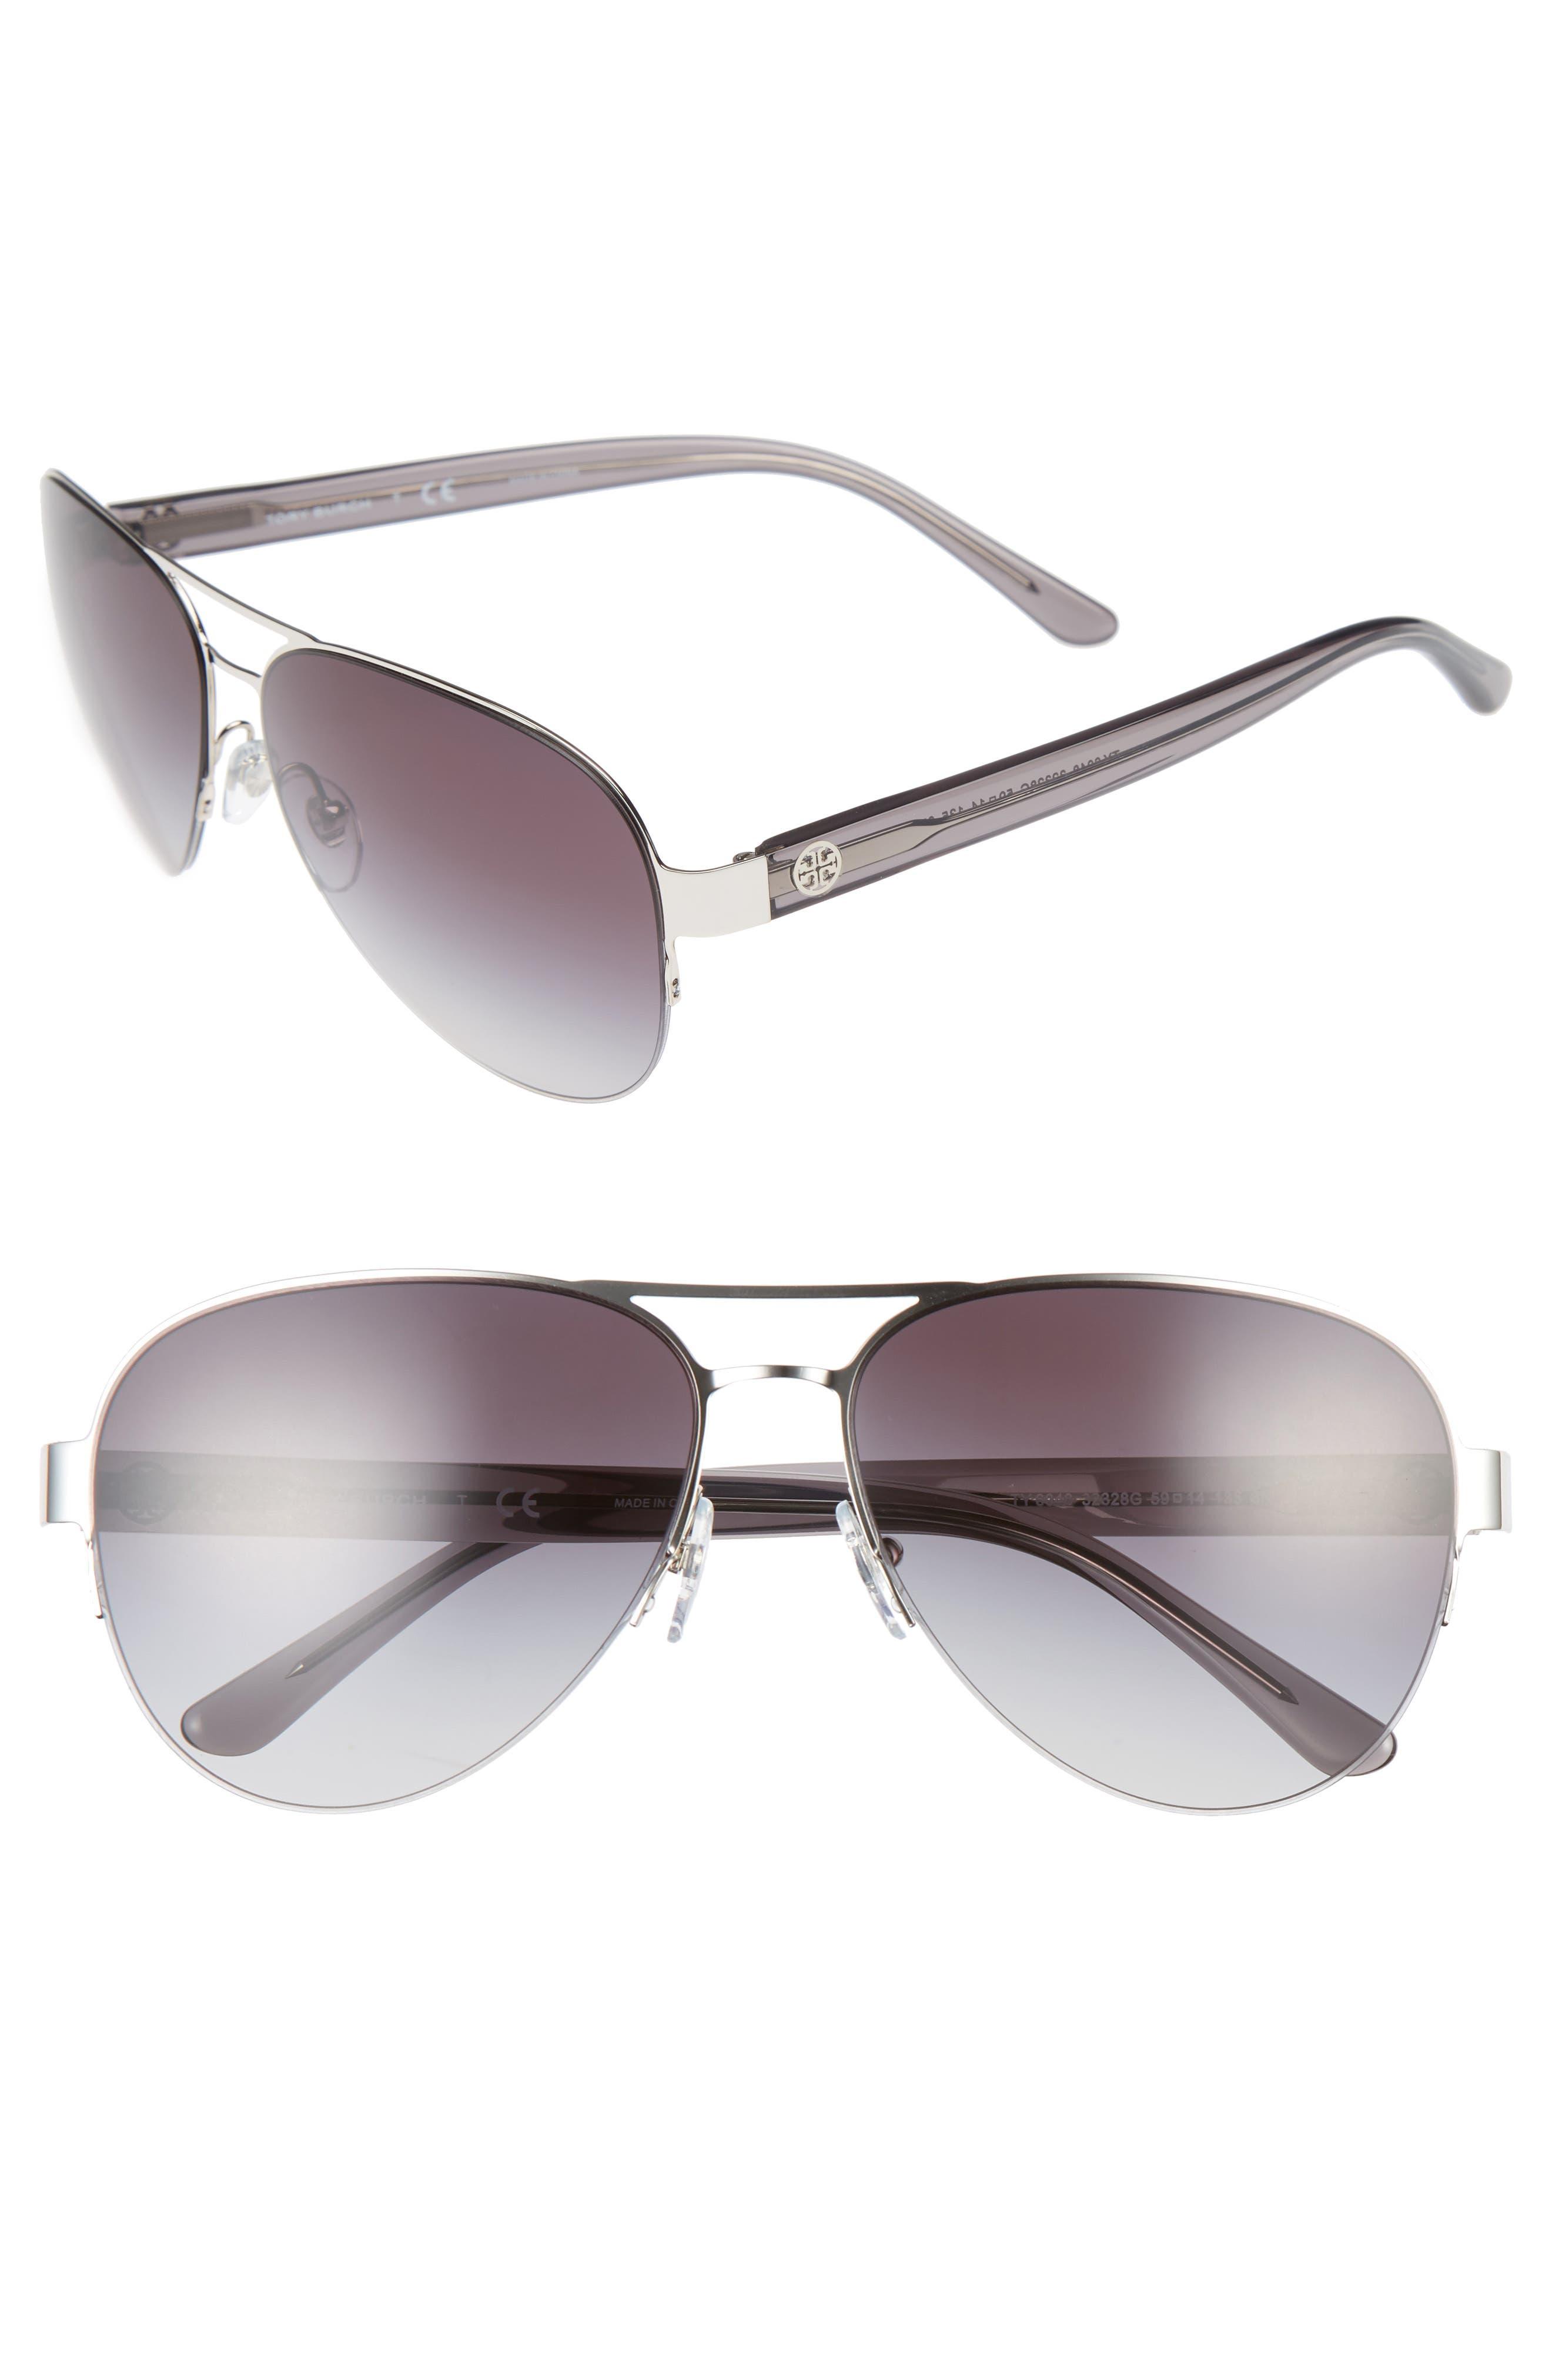 Tory Burch 59mm Aviator Sunglasses